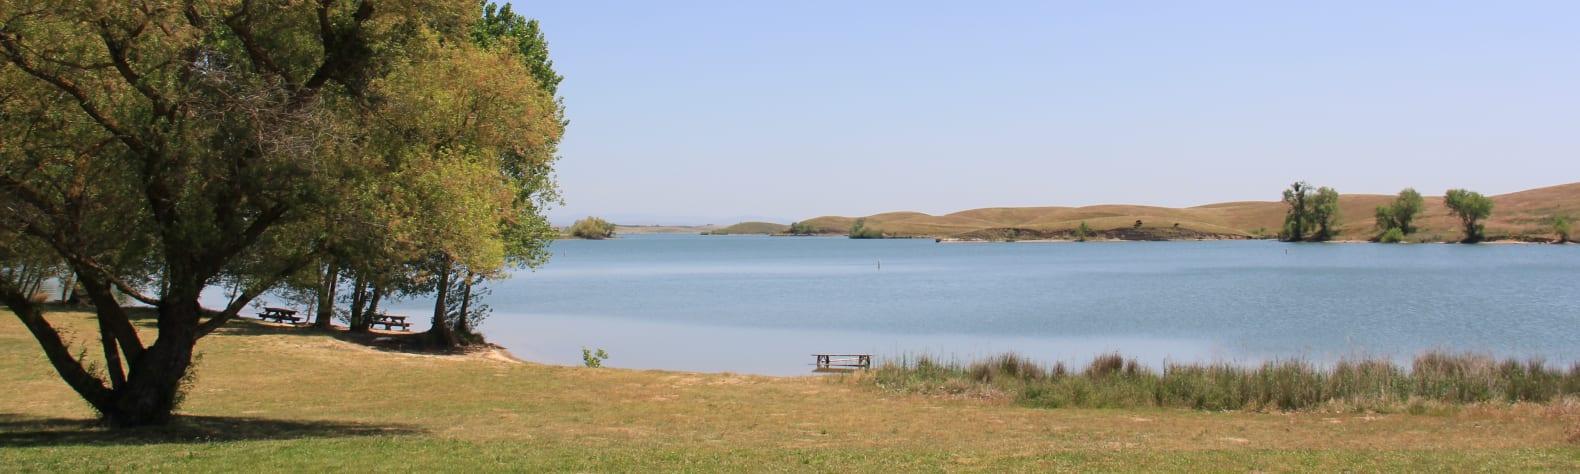 Turlock Lake State Recreation Area